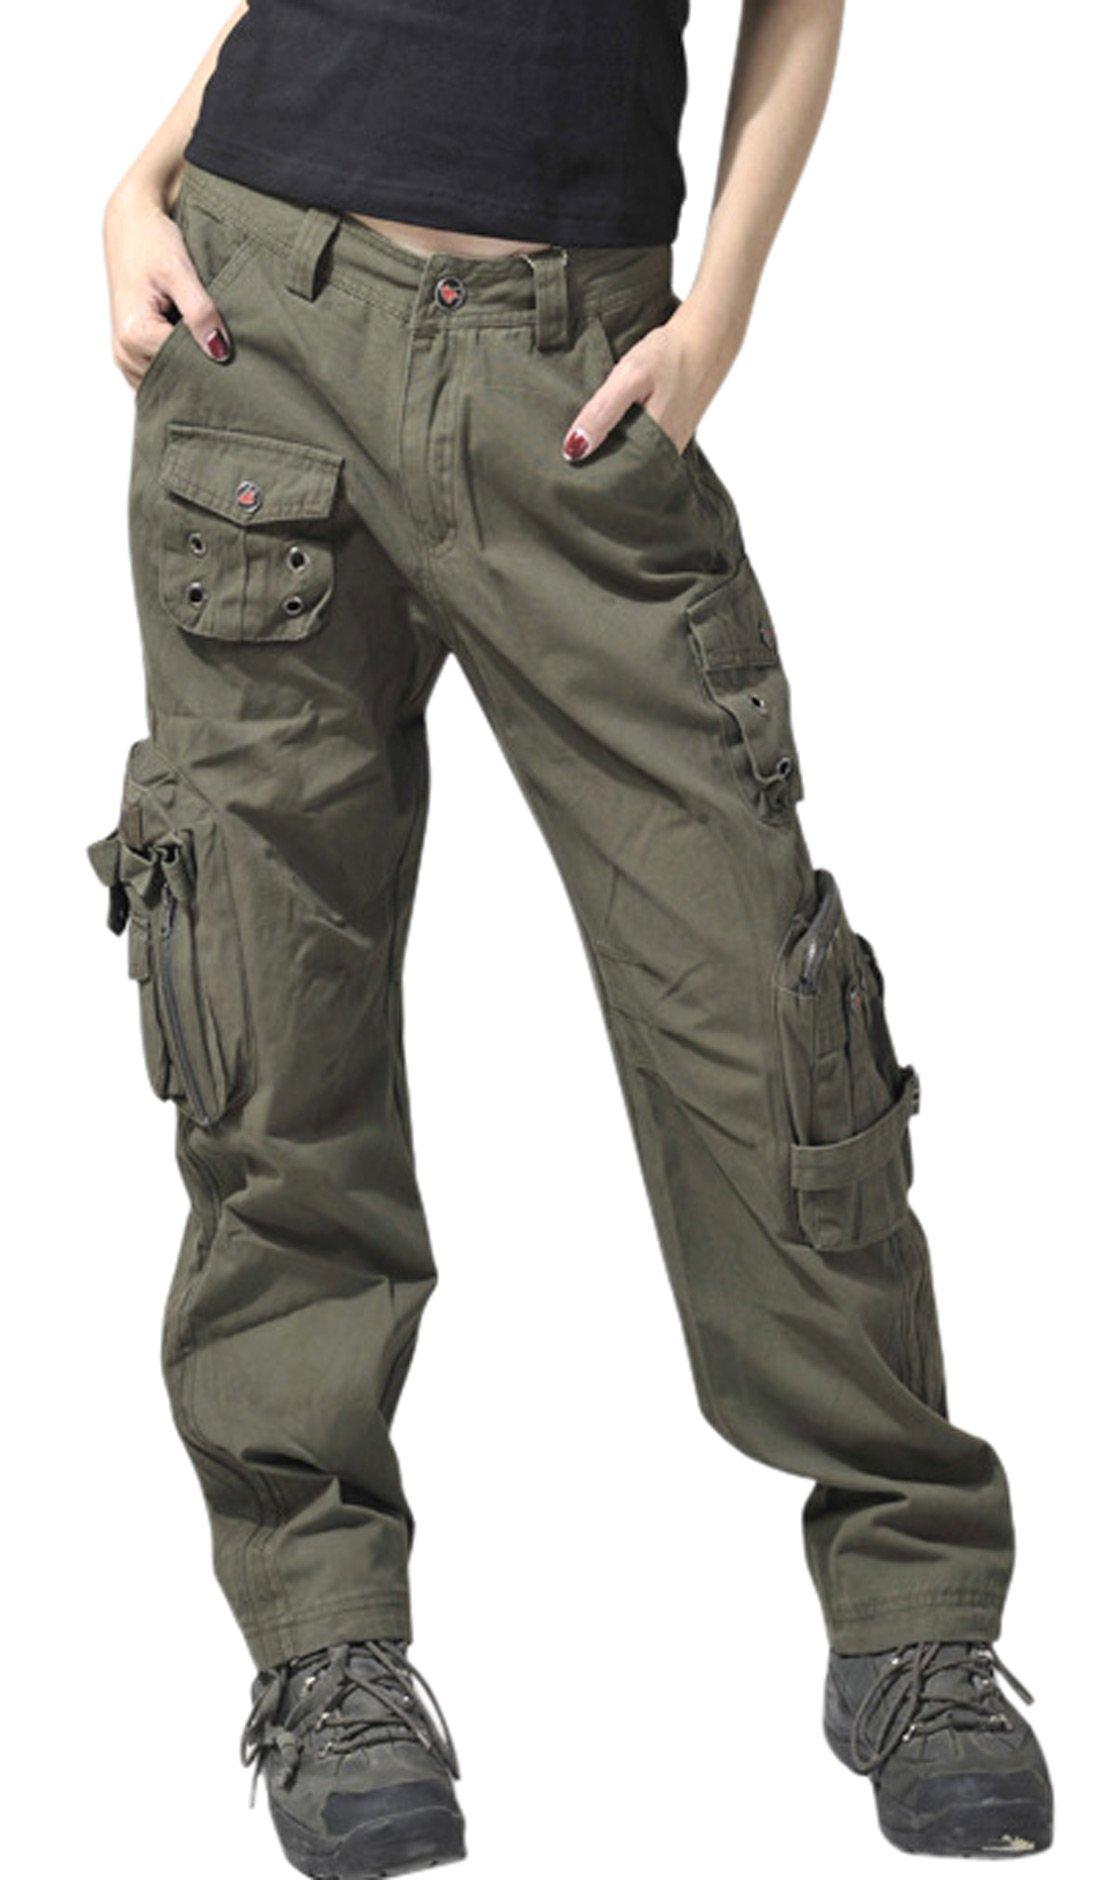 Chouyatou Women's Active Loose Fit Military Multi-Pockets Wild Cargo Pants (Medium, Army)